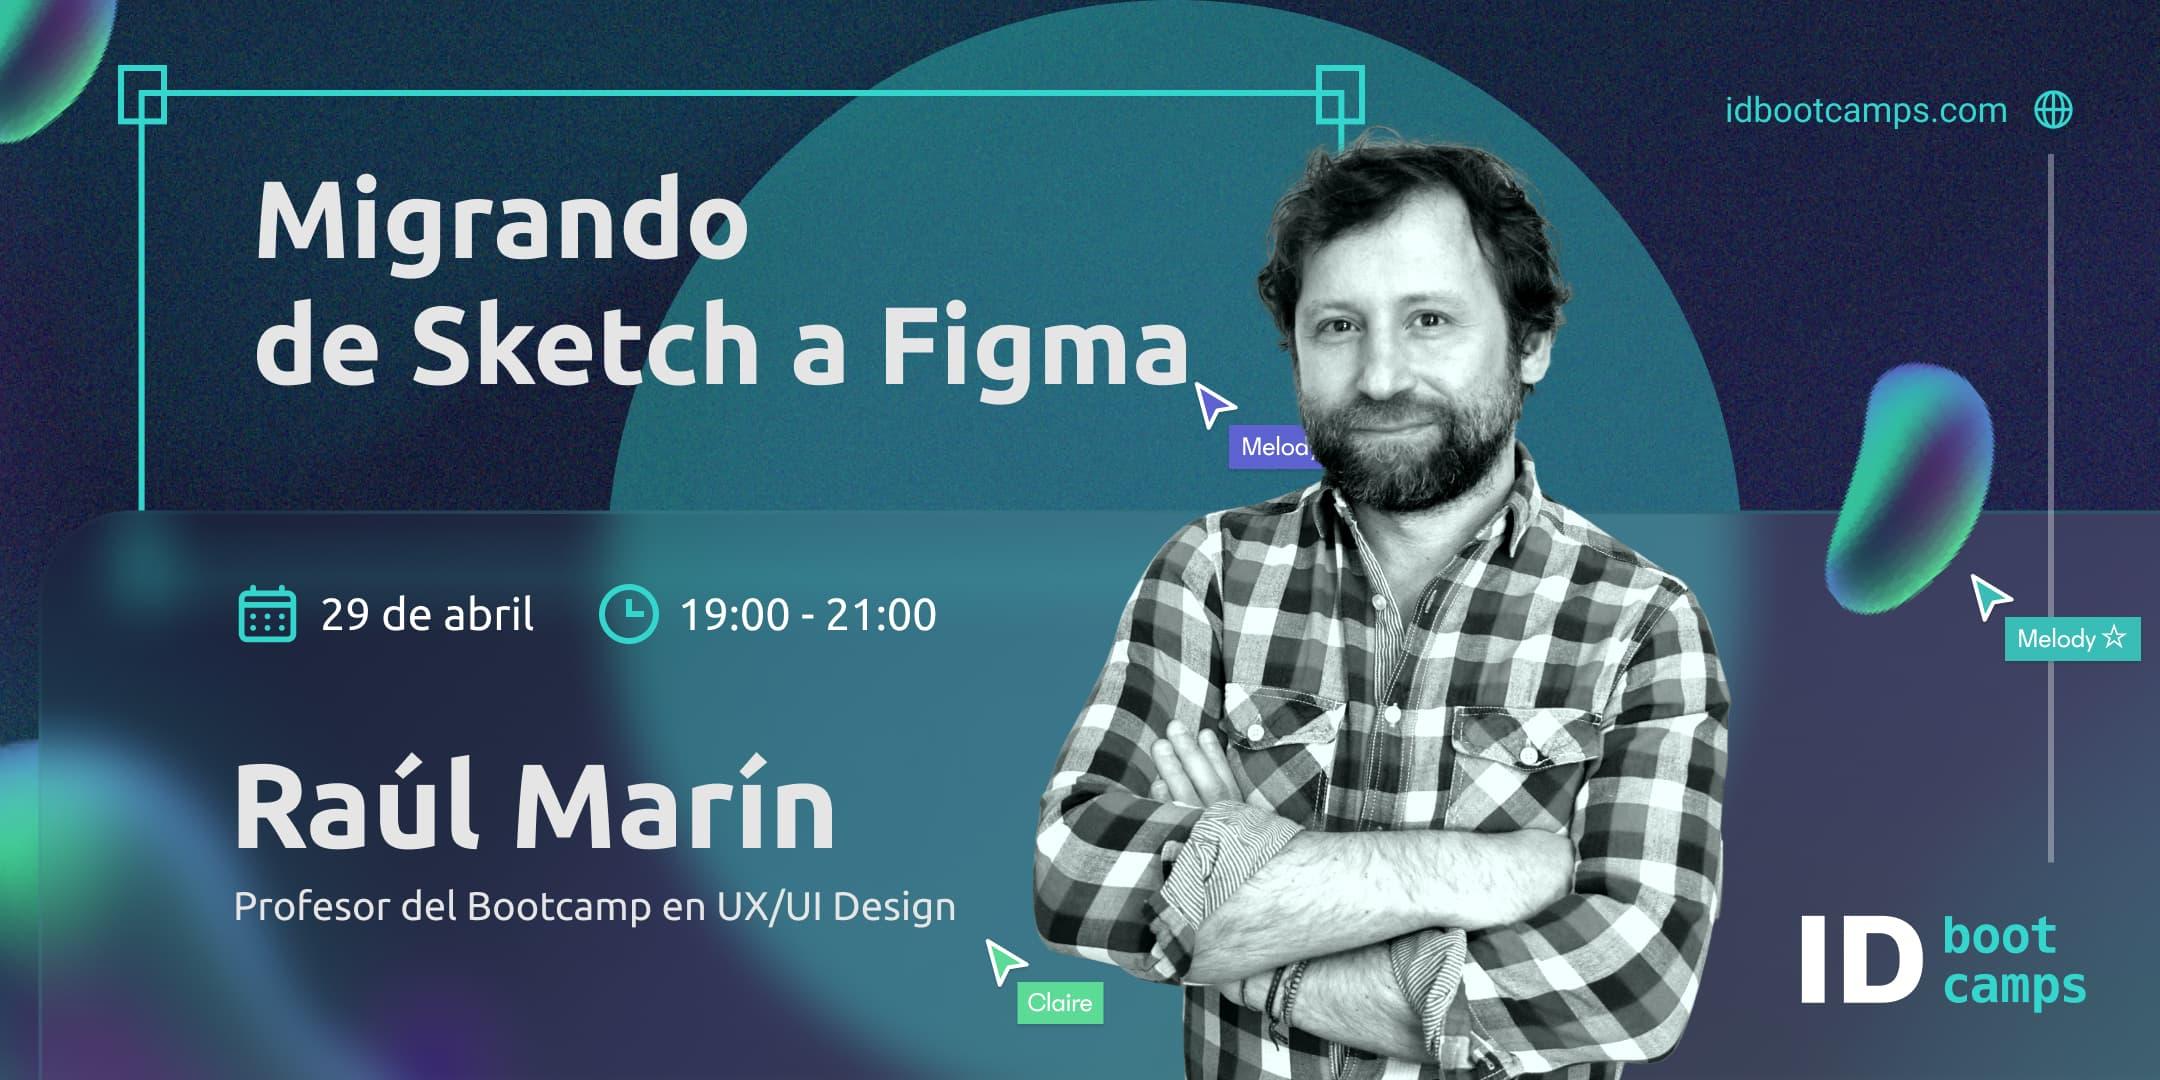 ID Bootcamps -Evento online Raúl Marín